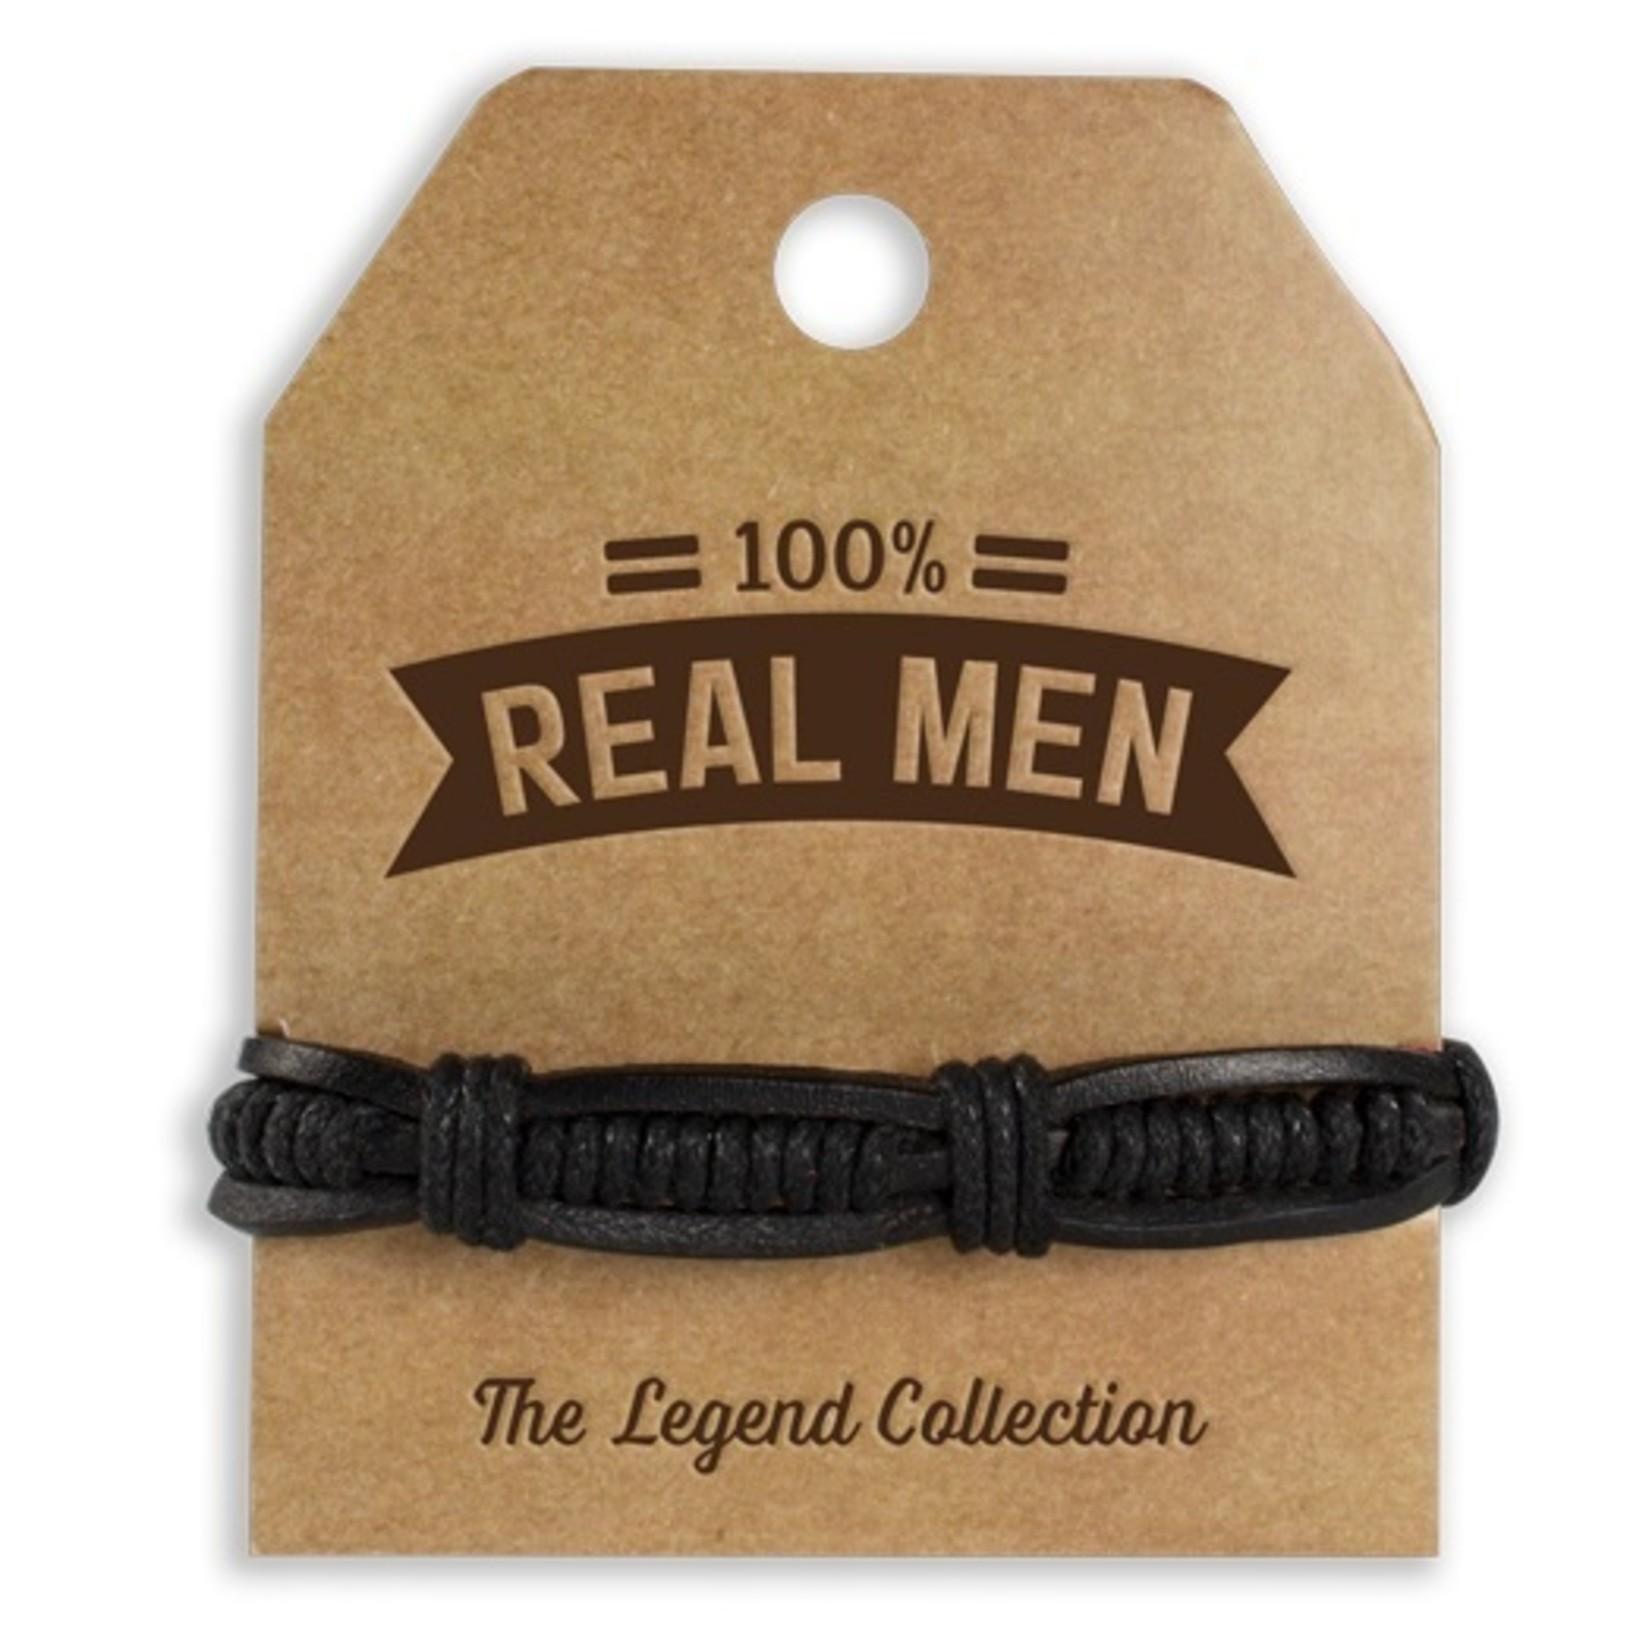 Miko Armband Legend 100% Real men